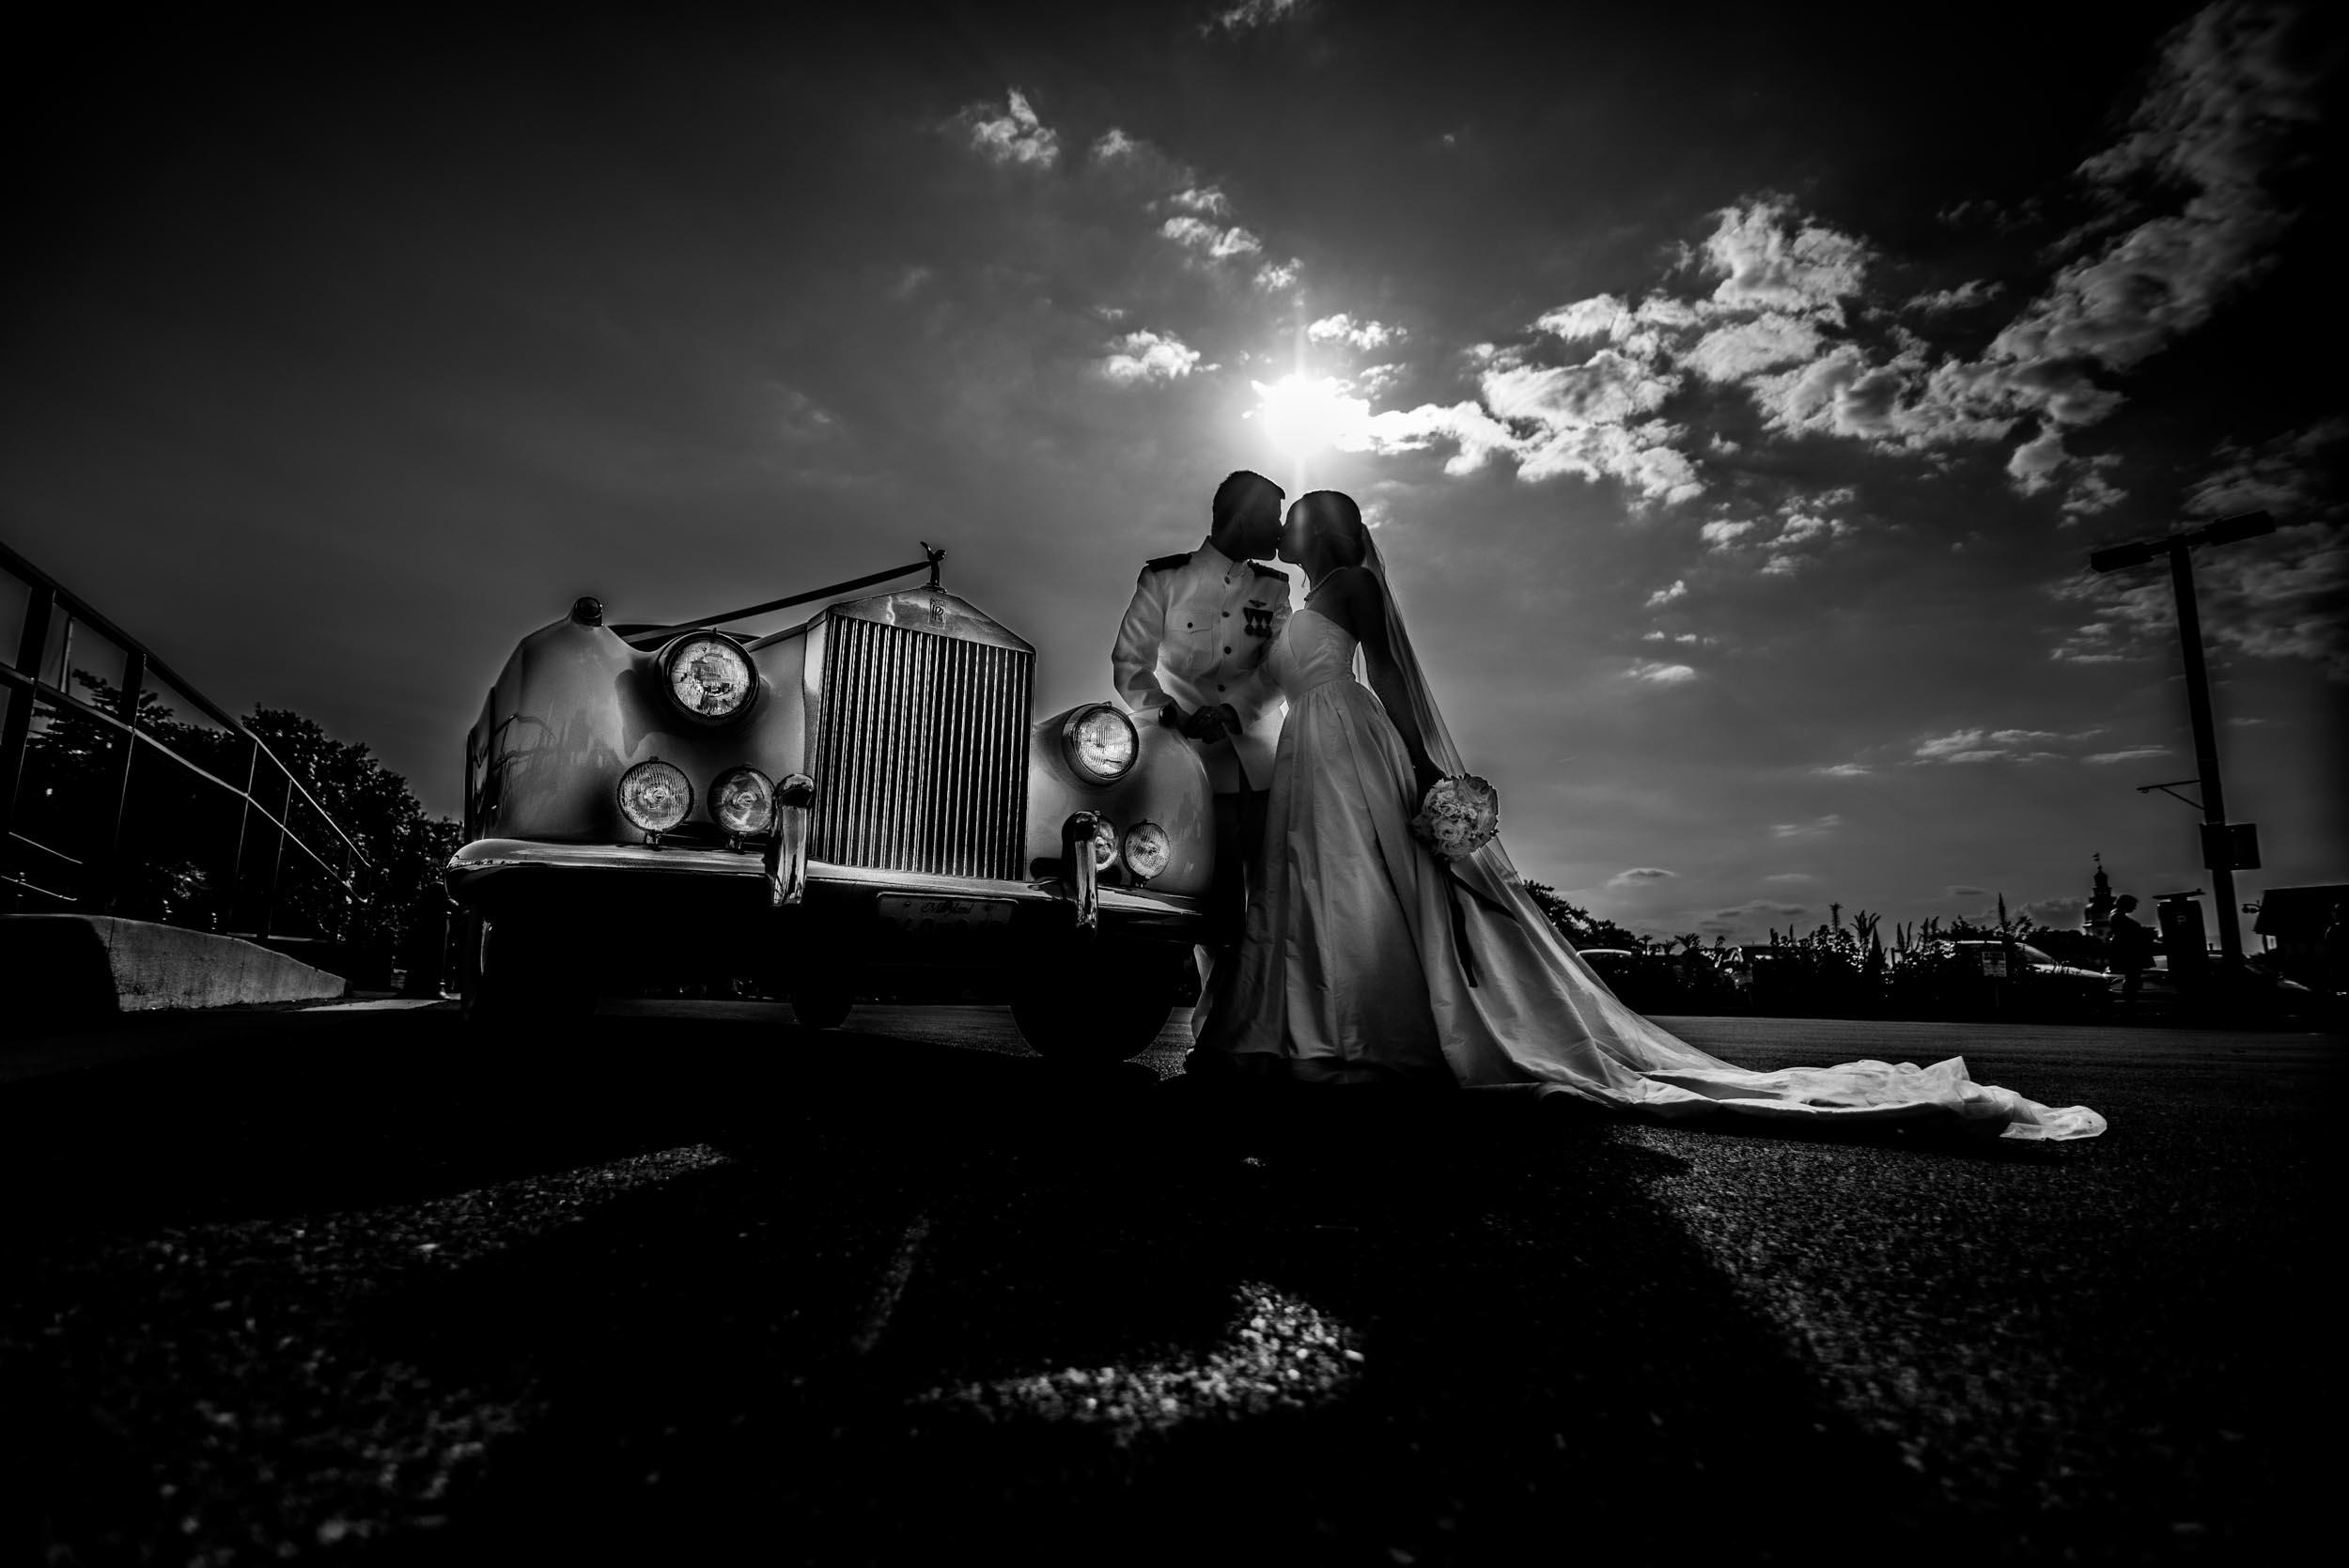 dc+metro+wedding+photographer+vadym+guliuk+photography+wedding+bride+and+groom-2058.jpg